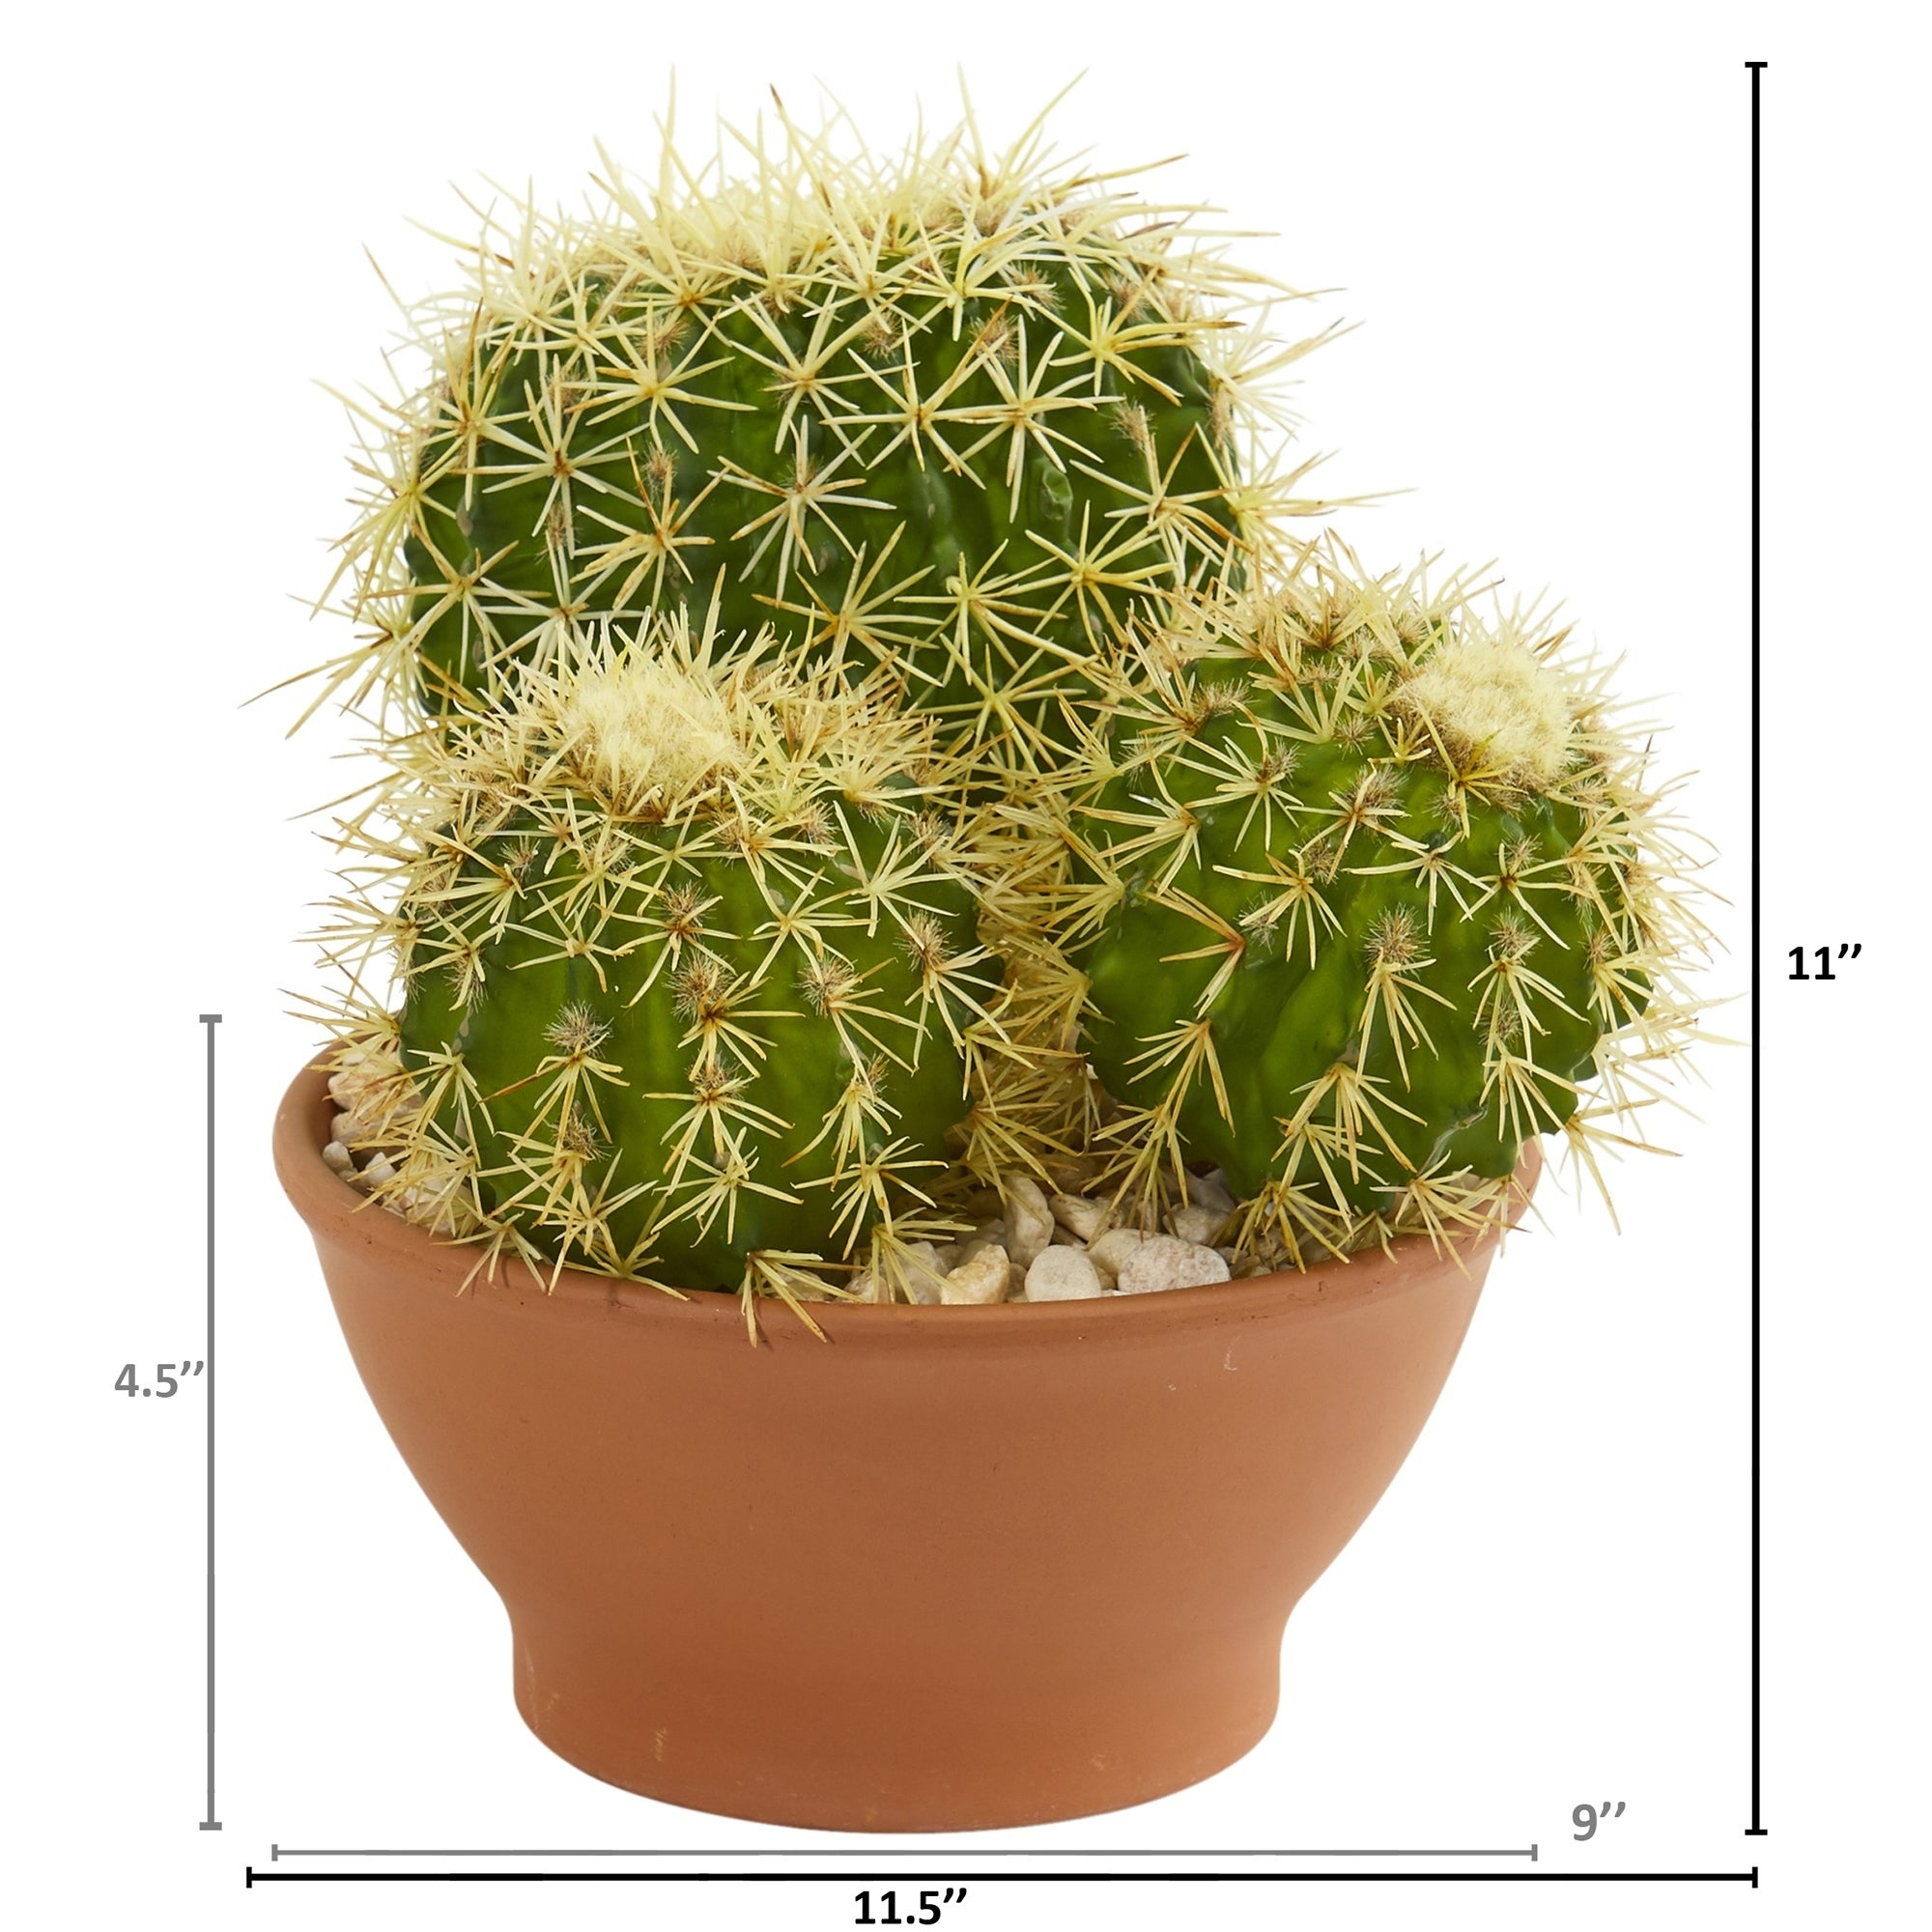 Shop Cactus Garden Artificial Plant In Decorative Planter